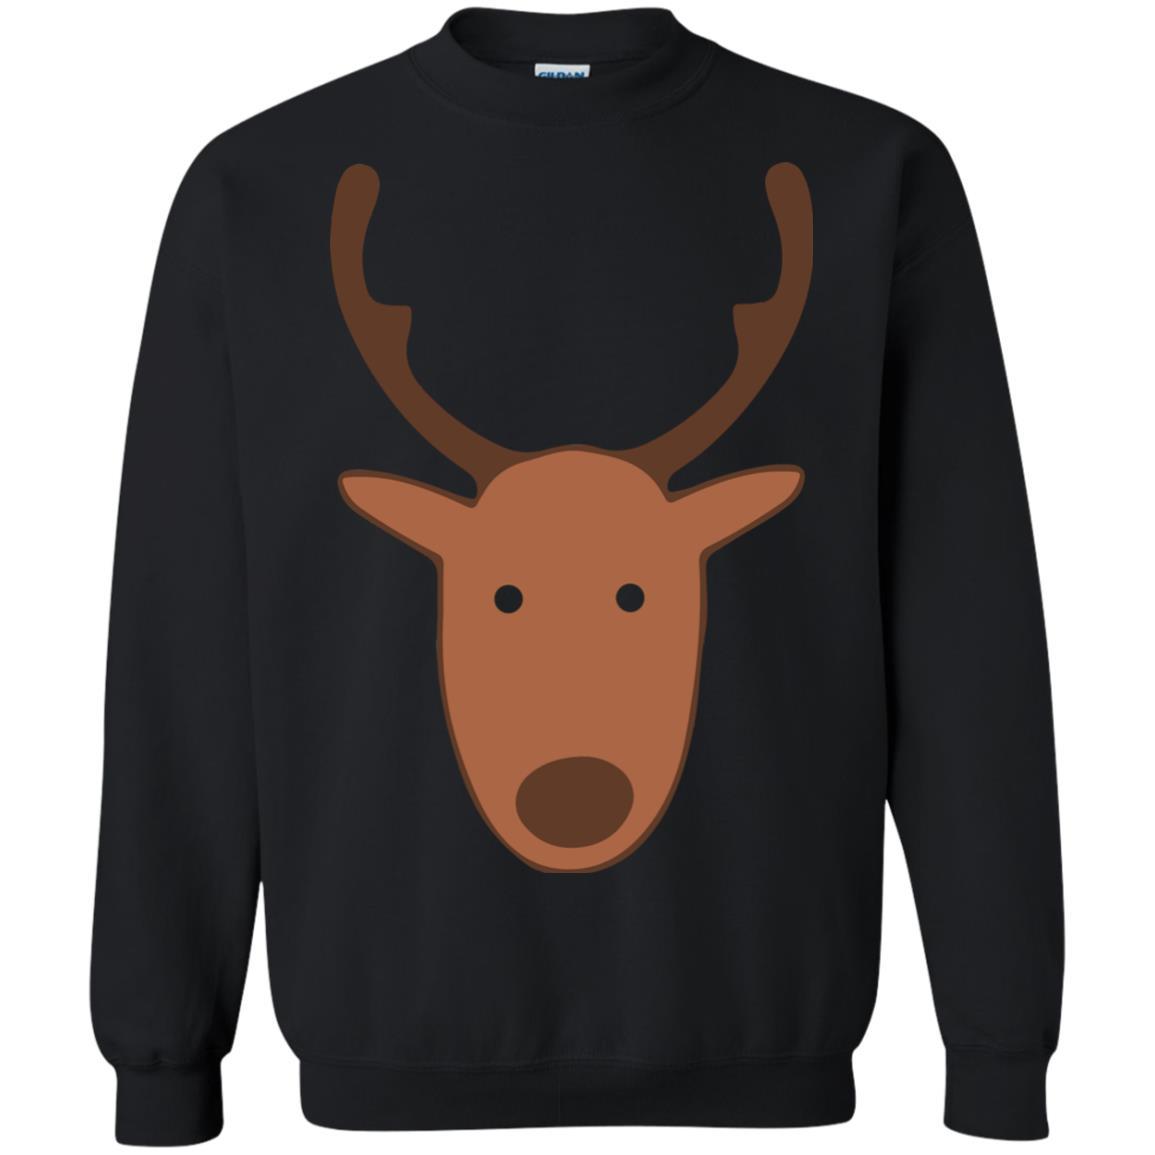 image 4773 - Tina Belcher Reindeer Christmas Sweater, Shirt, Hoodie